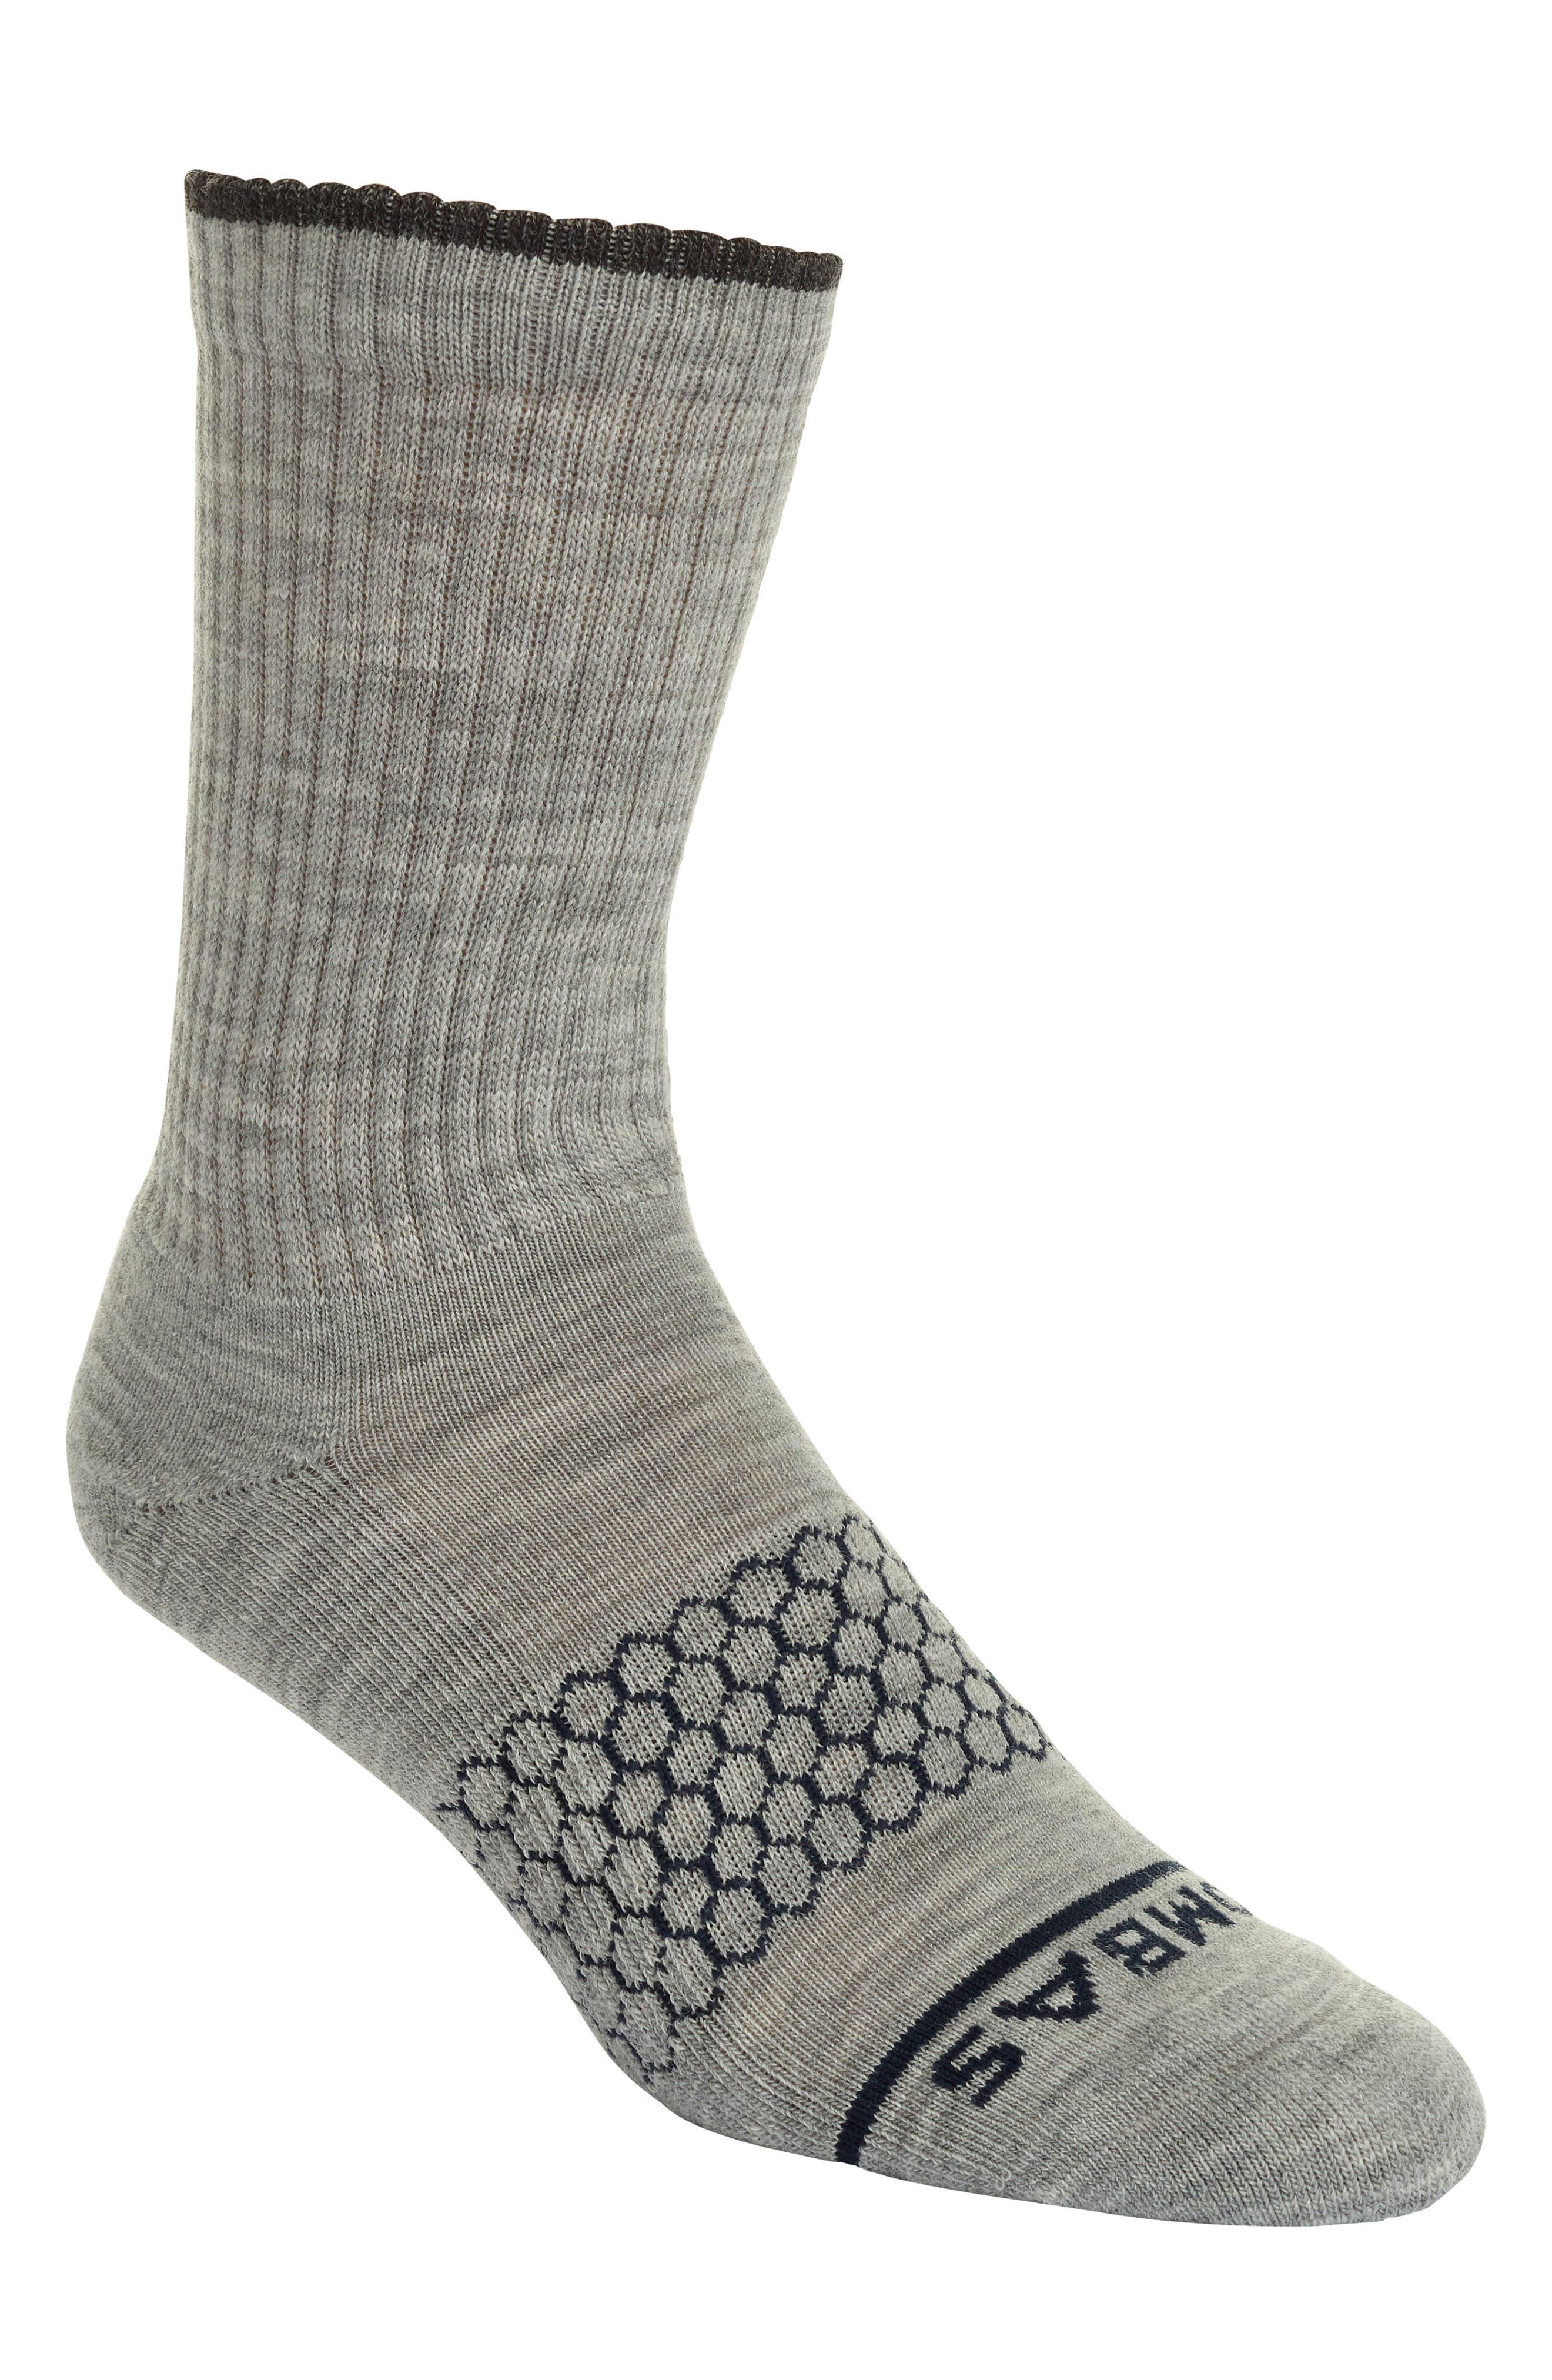 Bombas Merino Wool Blend Crew Socks